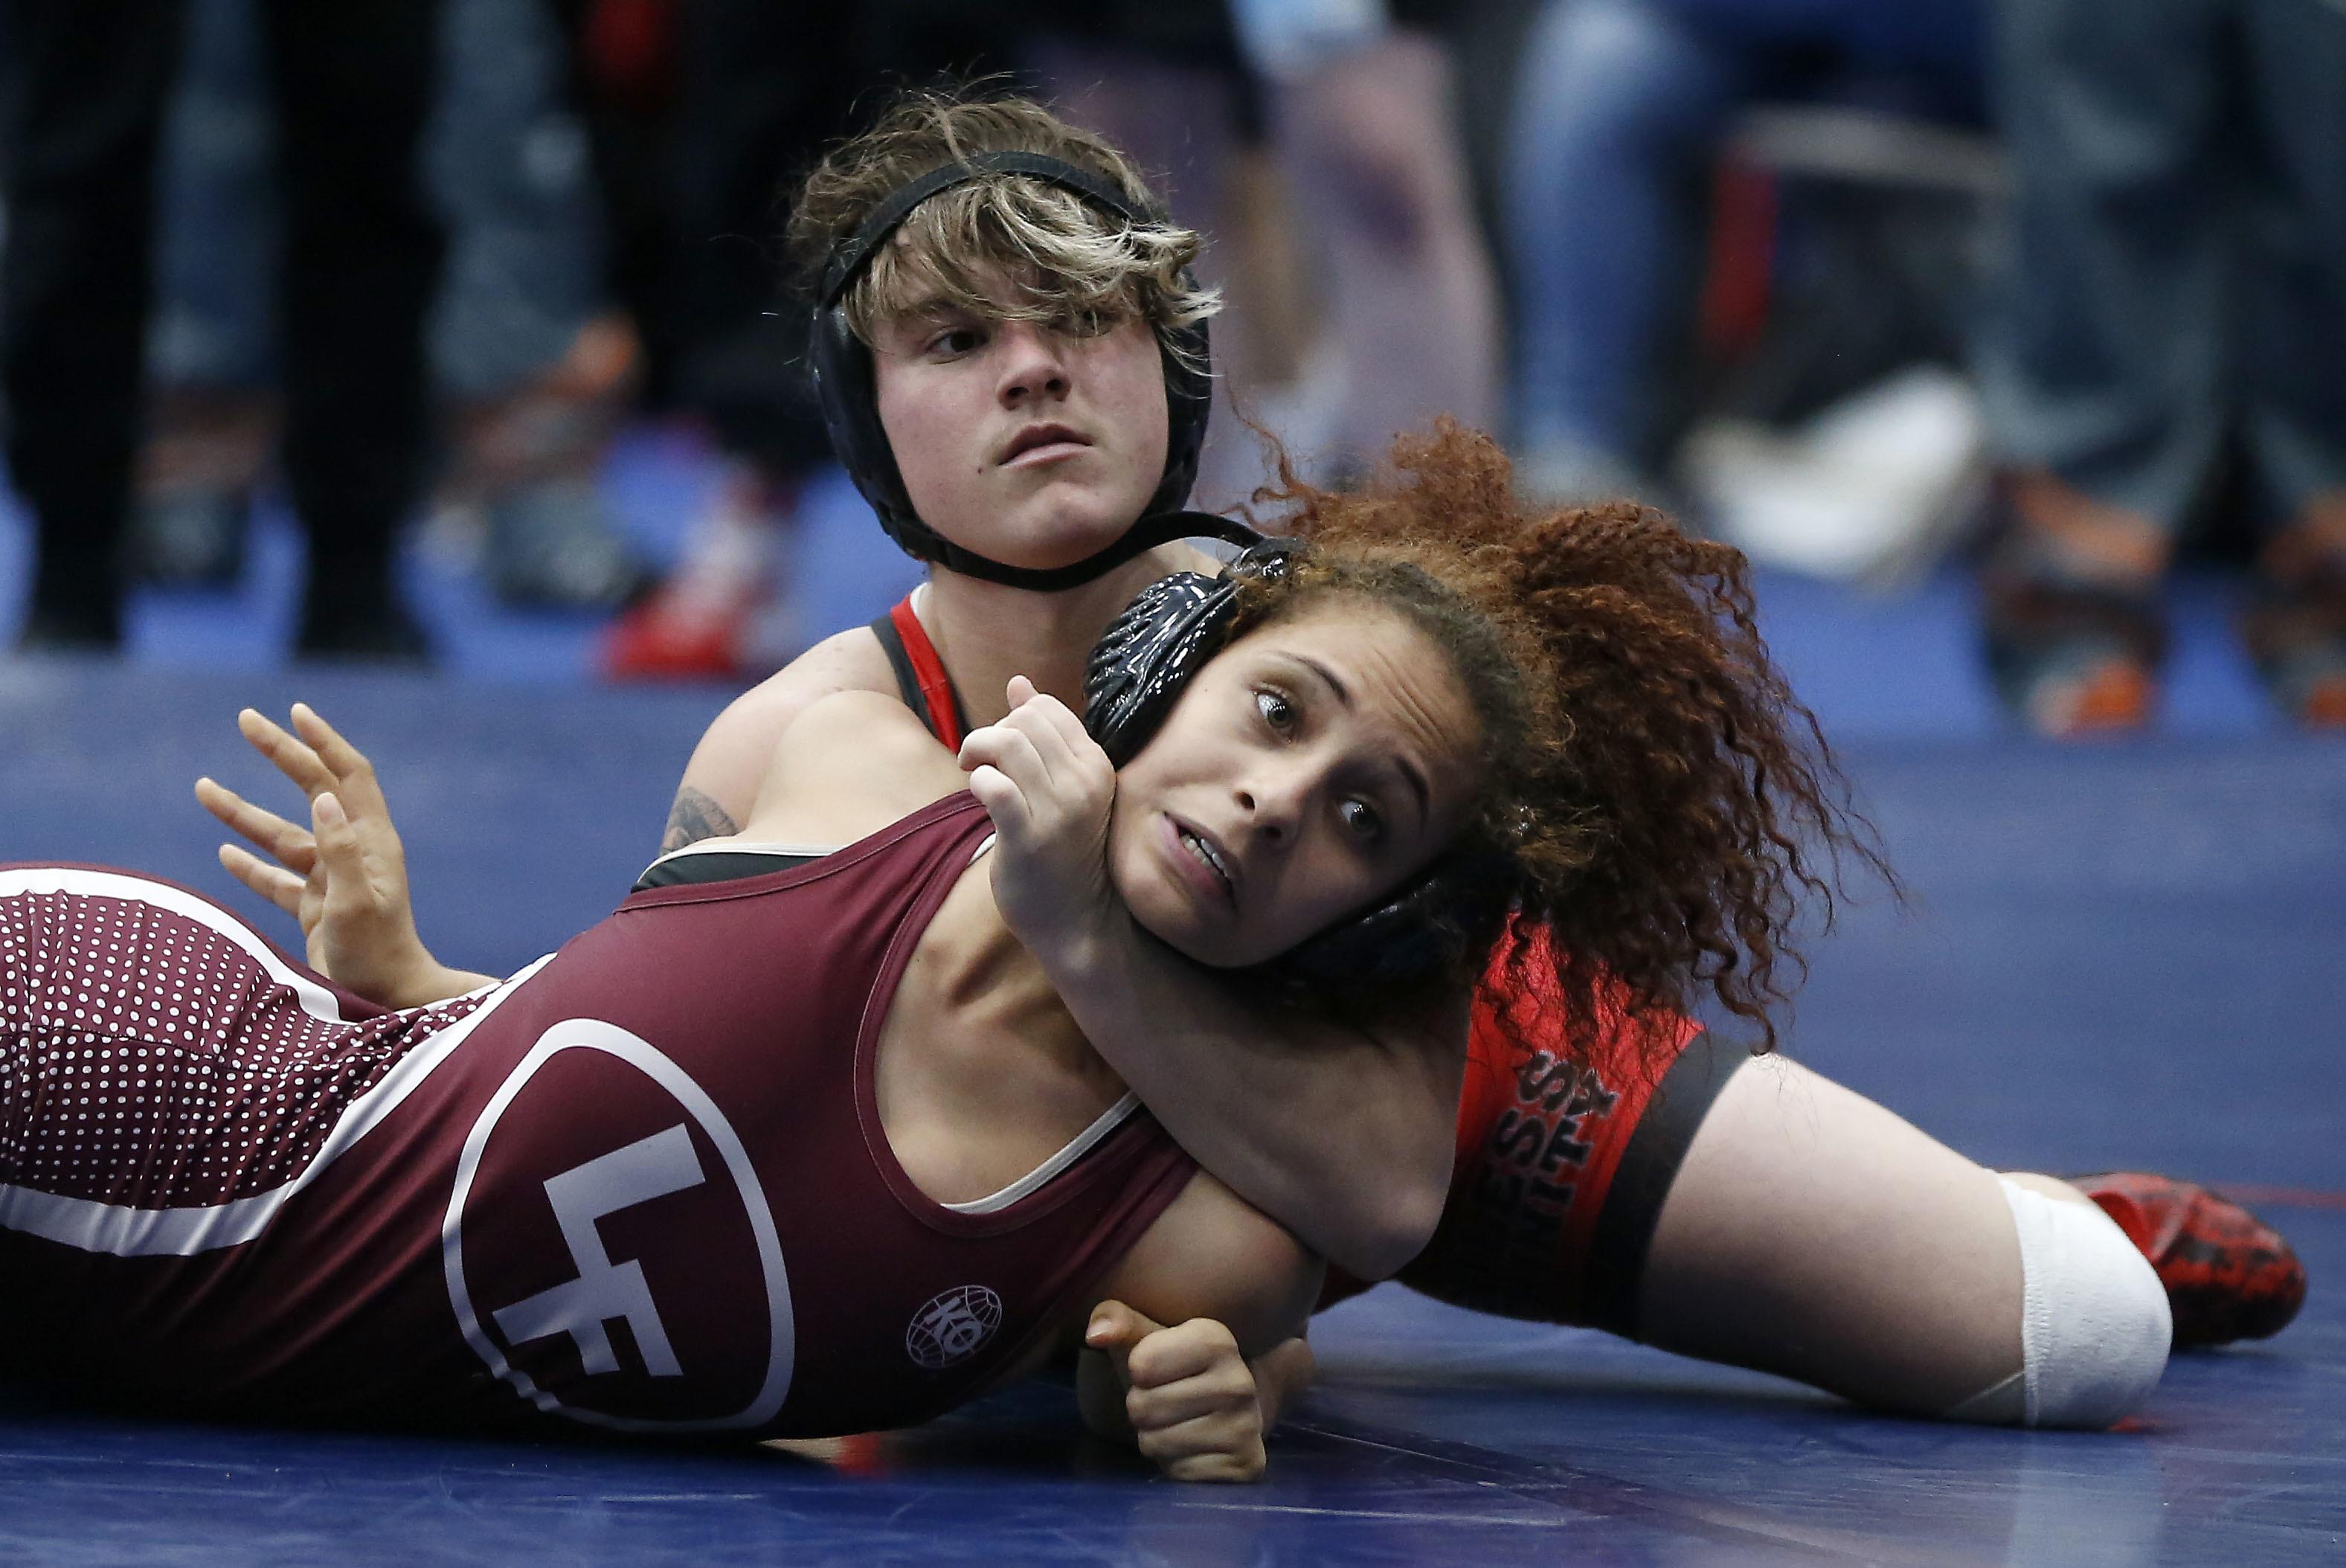 Girls sue to block participation of transgender athletes